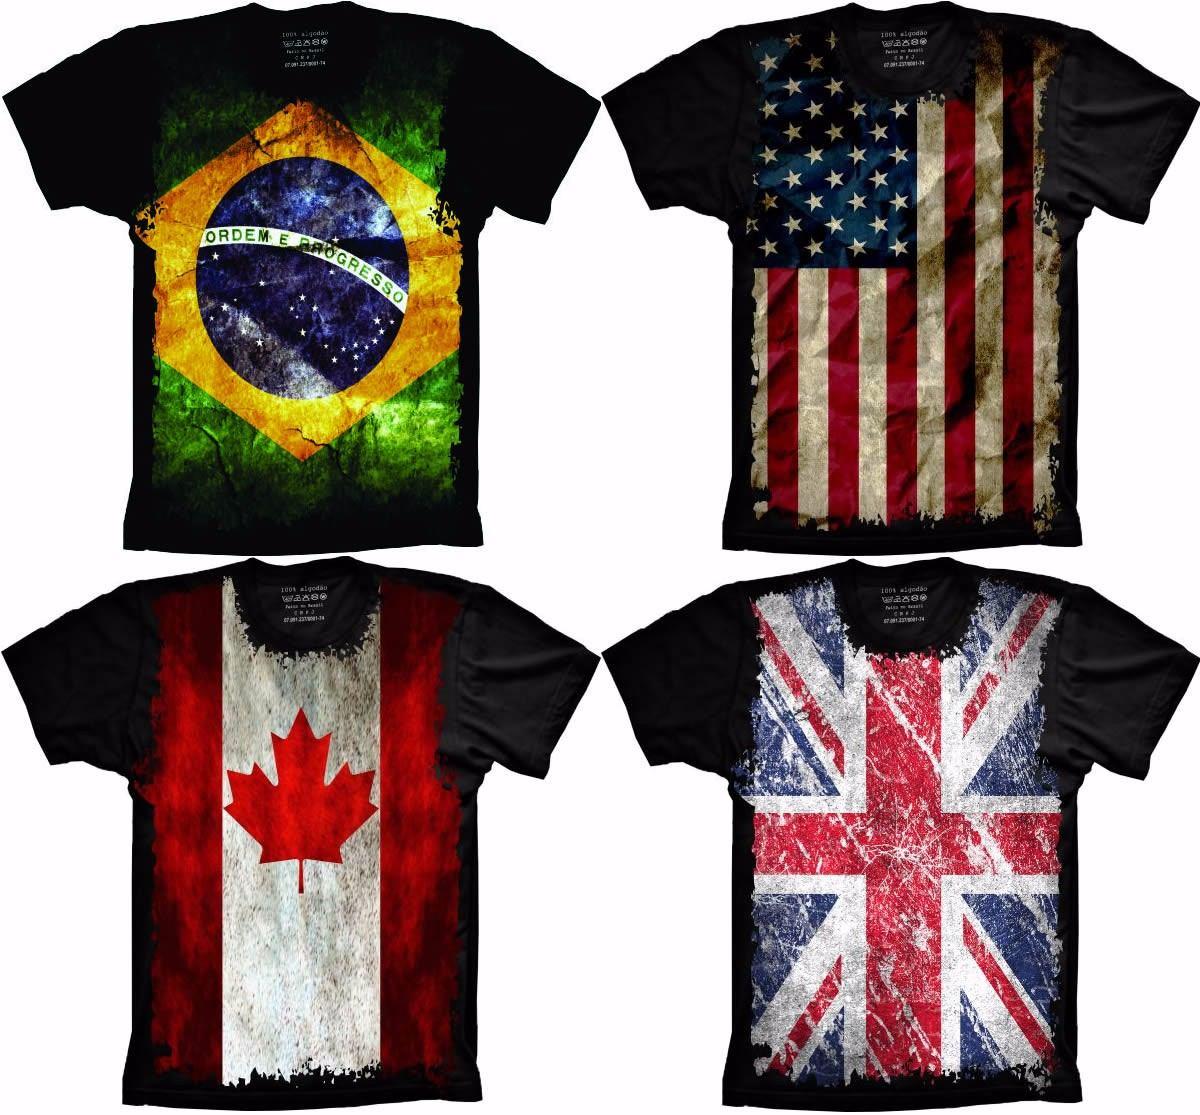 51b095c02d camiseta bandeira estados unidos america tshit camisa eua. Carregando zoom.